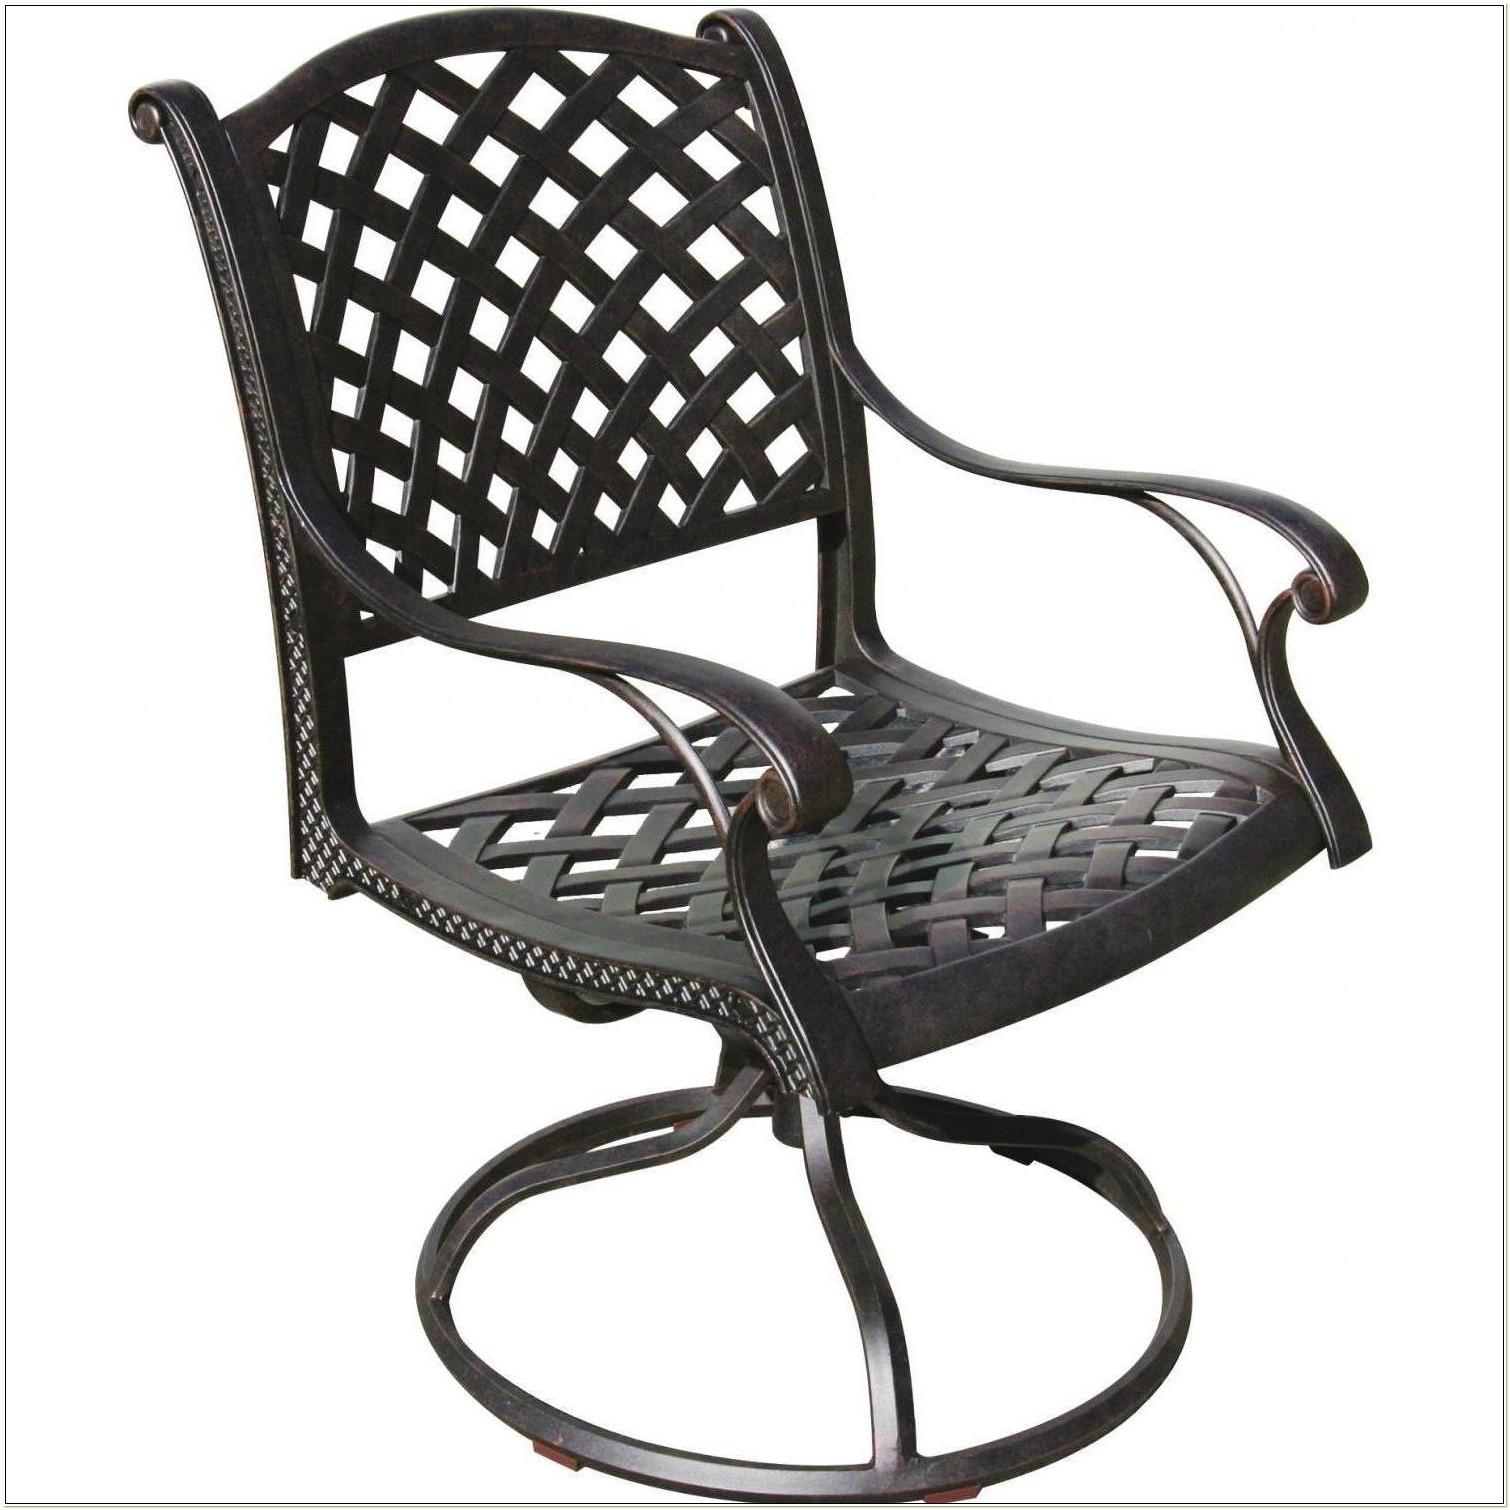 Cast Aluminum Swivel Rocker Patio Chairs